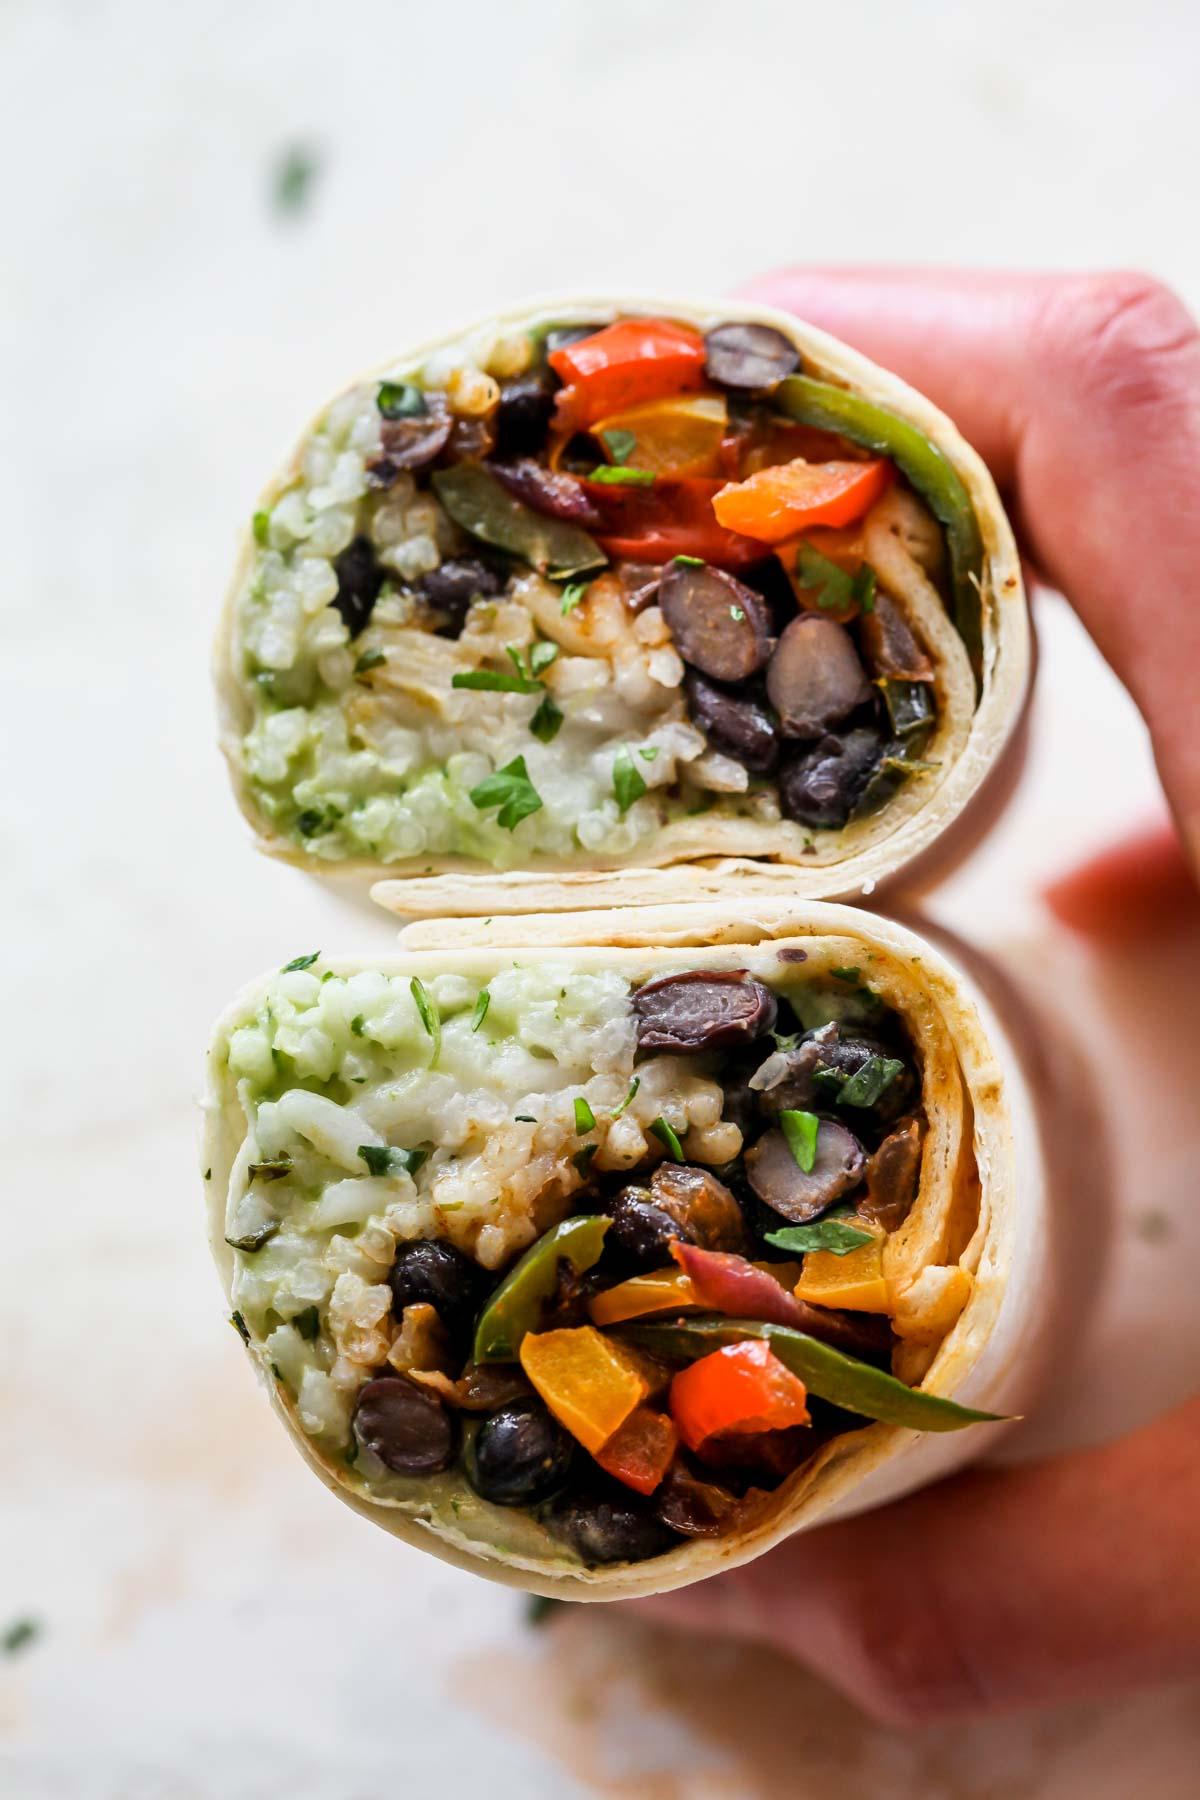 Vegetarian burrito sliced in half to see the fillings